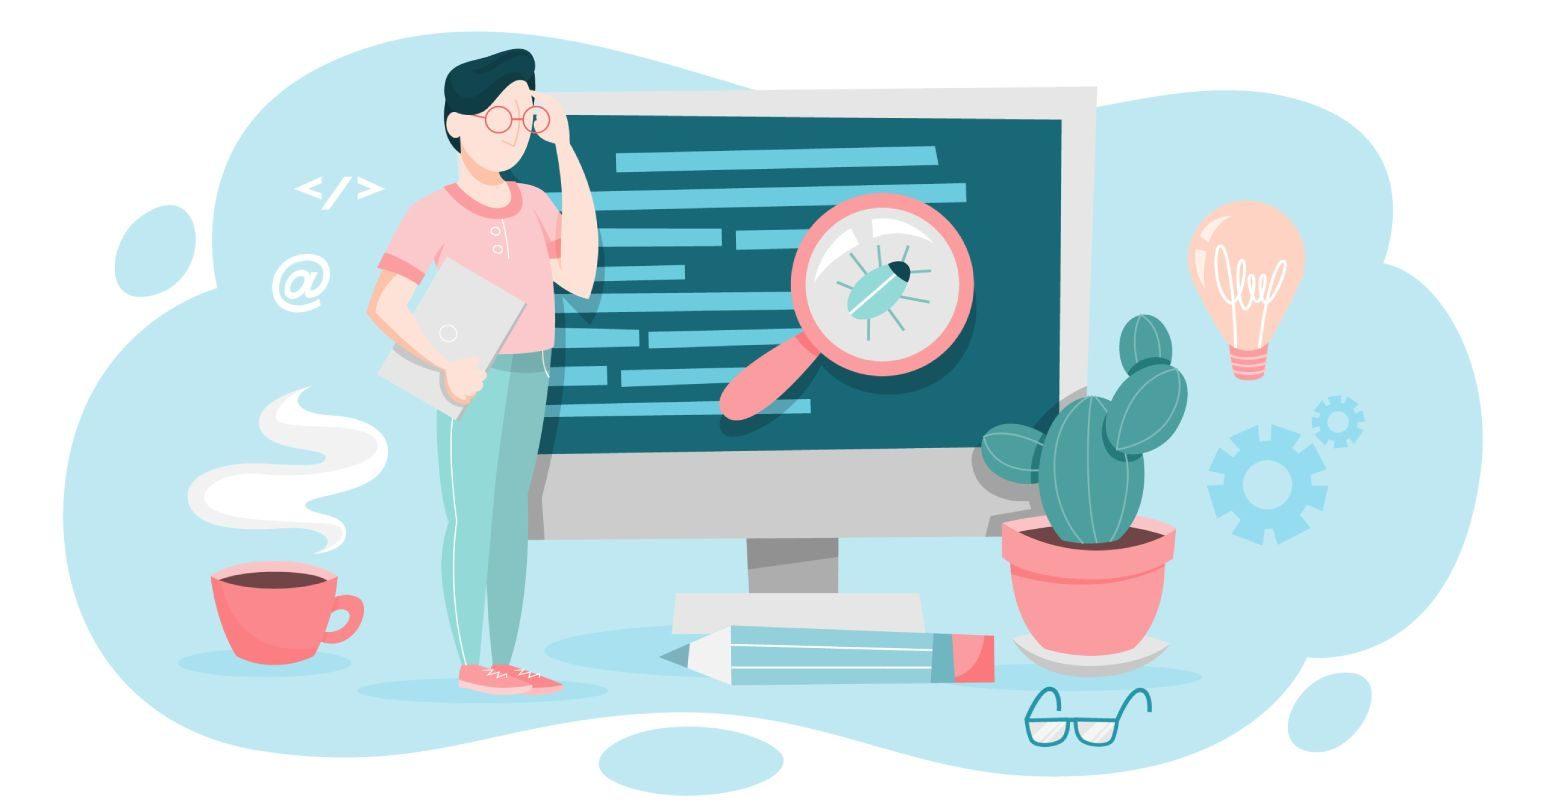 HTML/CSS初学者がつまづきやすい記述ミスと修正方法